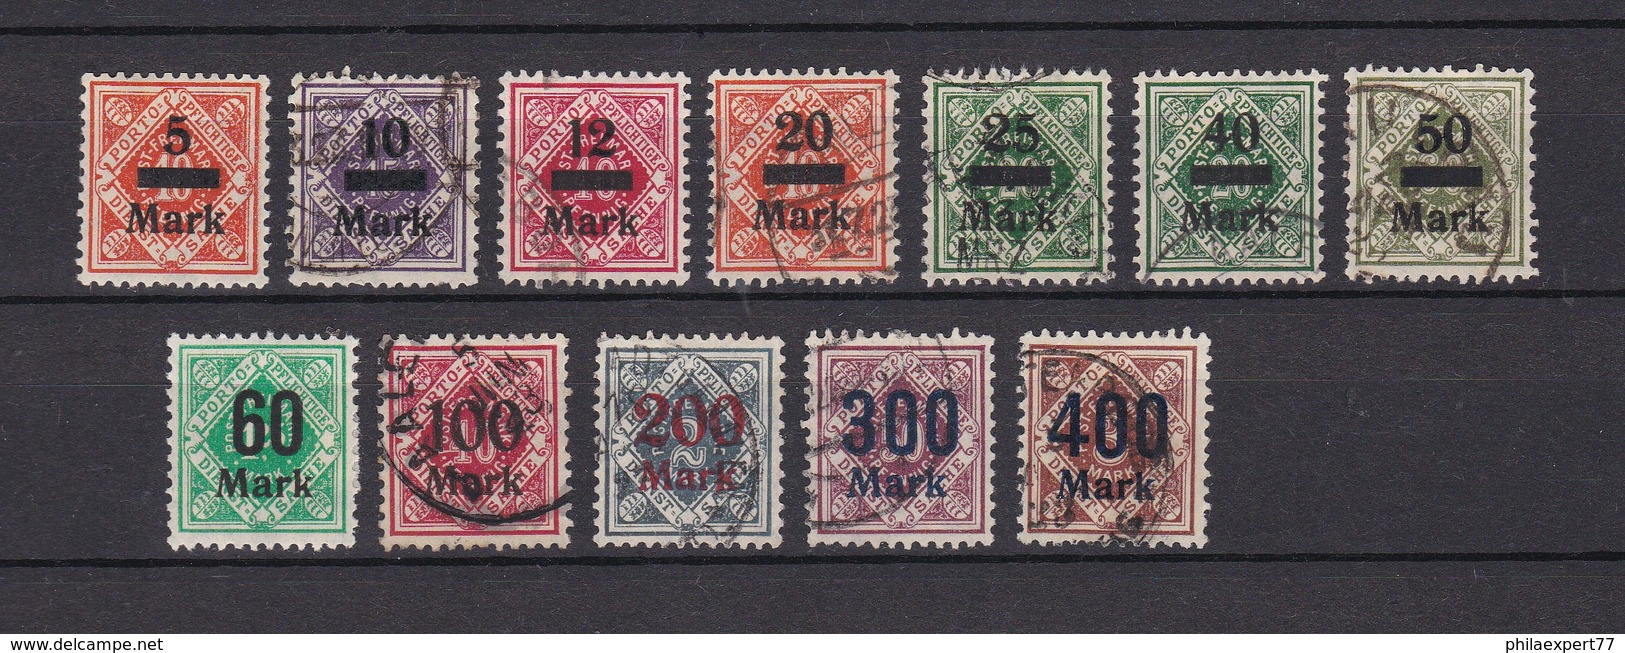 Wuerttemberg - Dienstmarken - 1922/23 - Michel Nr. 159/170 - 45 Euro - Wuerttemberg